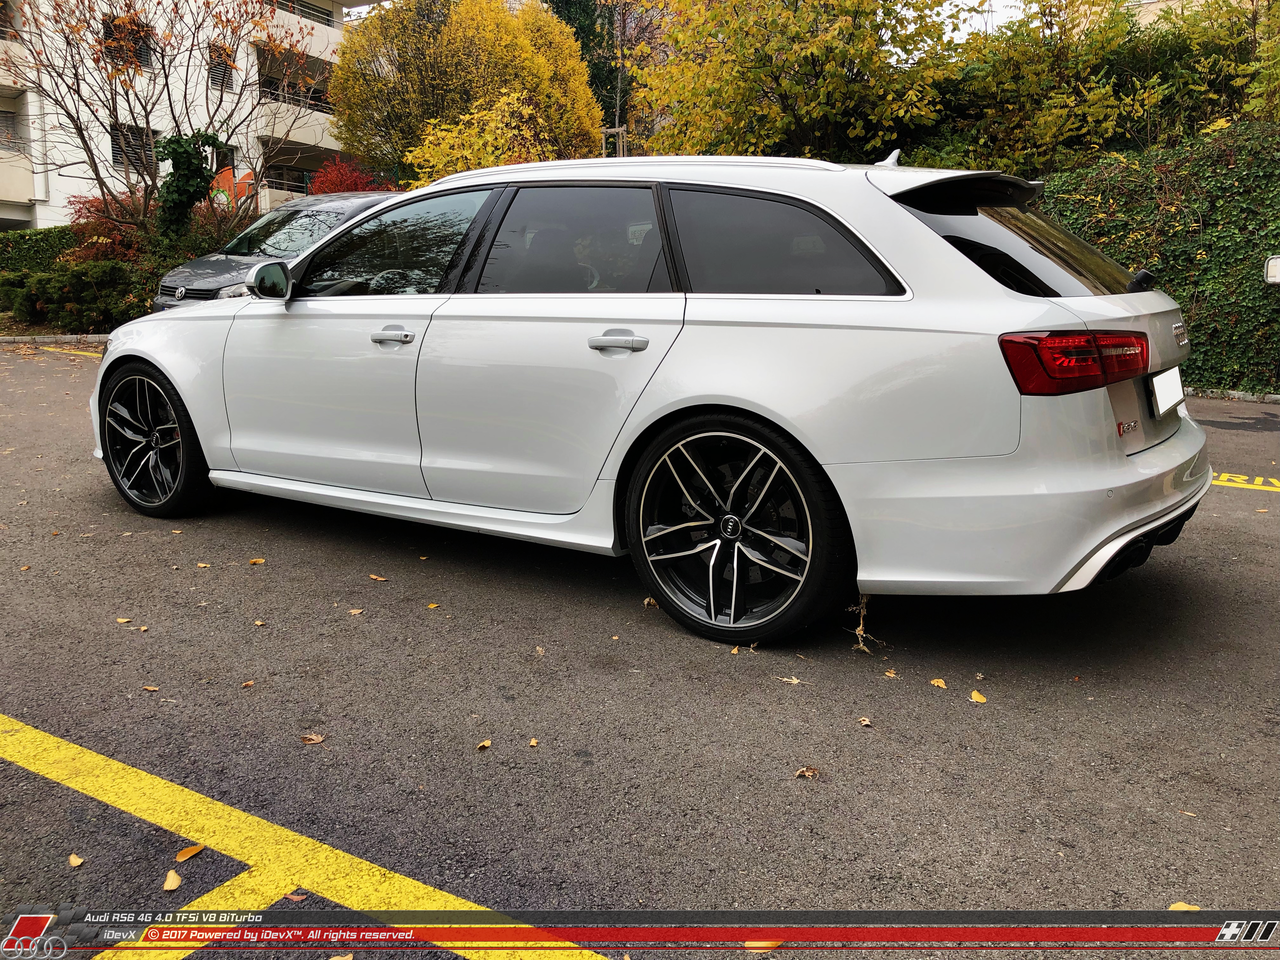 10_11.2018_Audi-RS6_iDevX_026.png